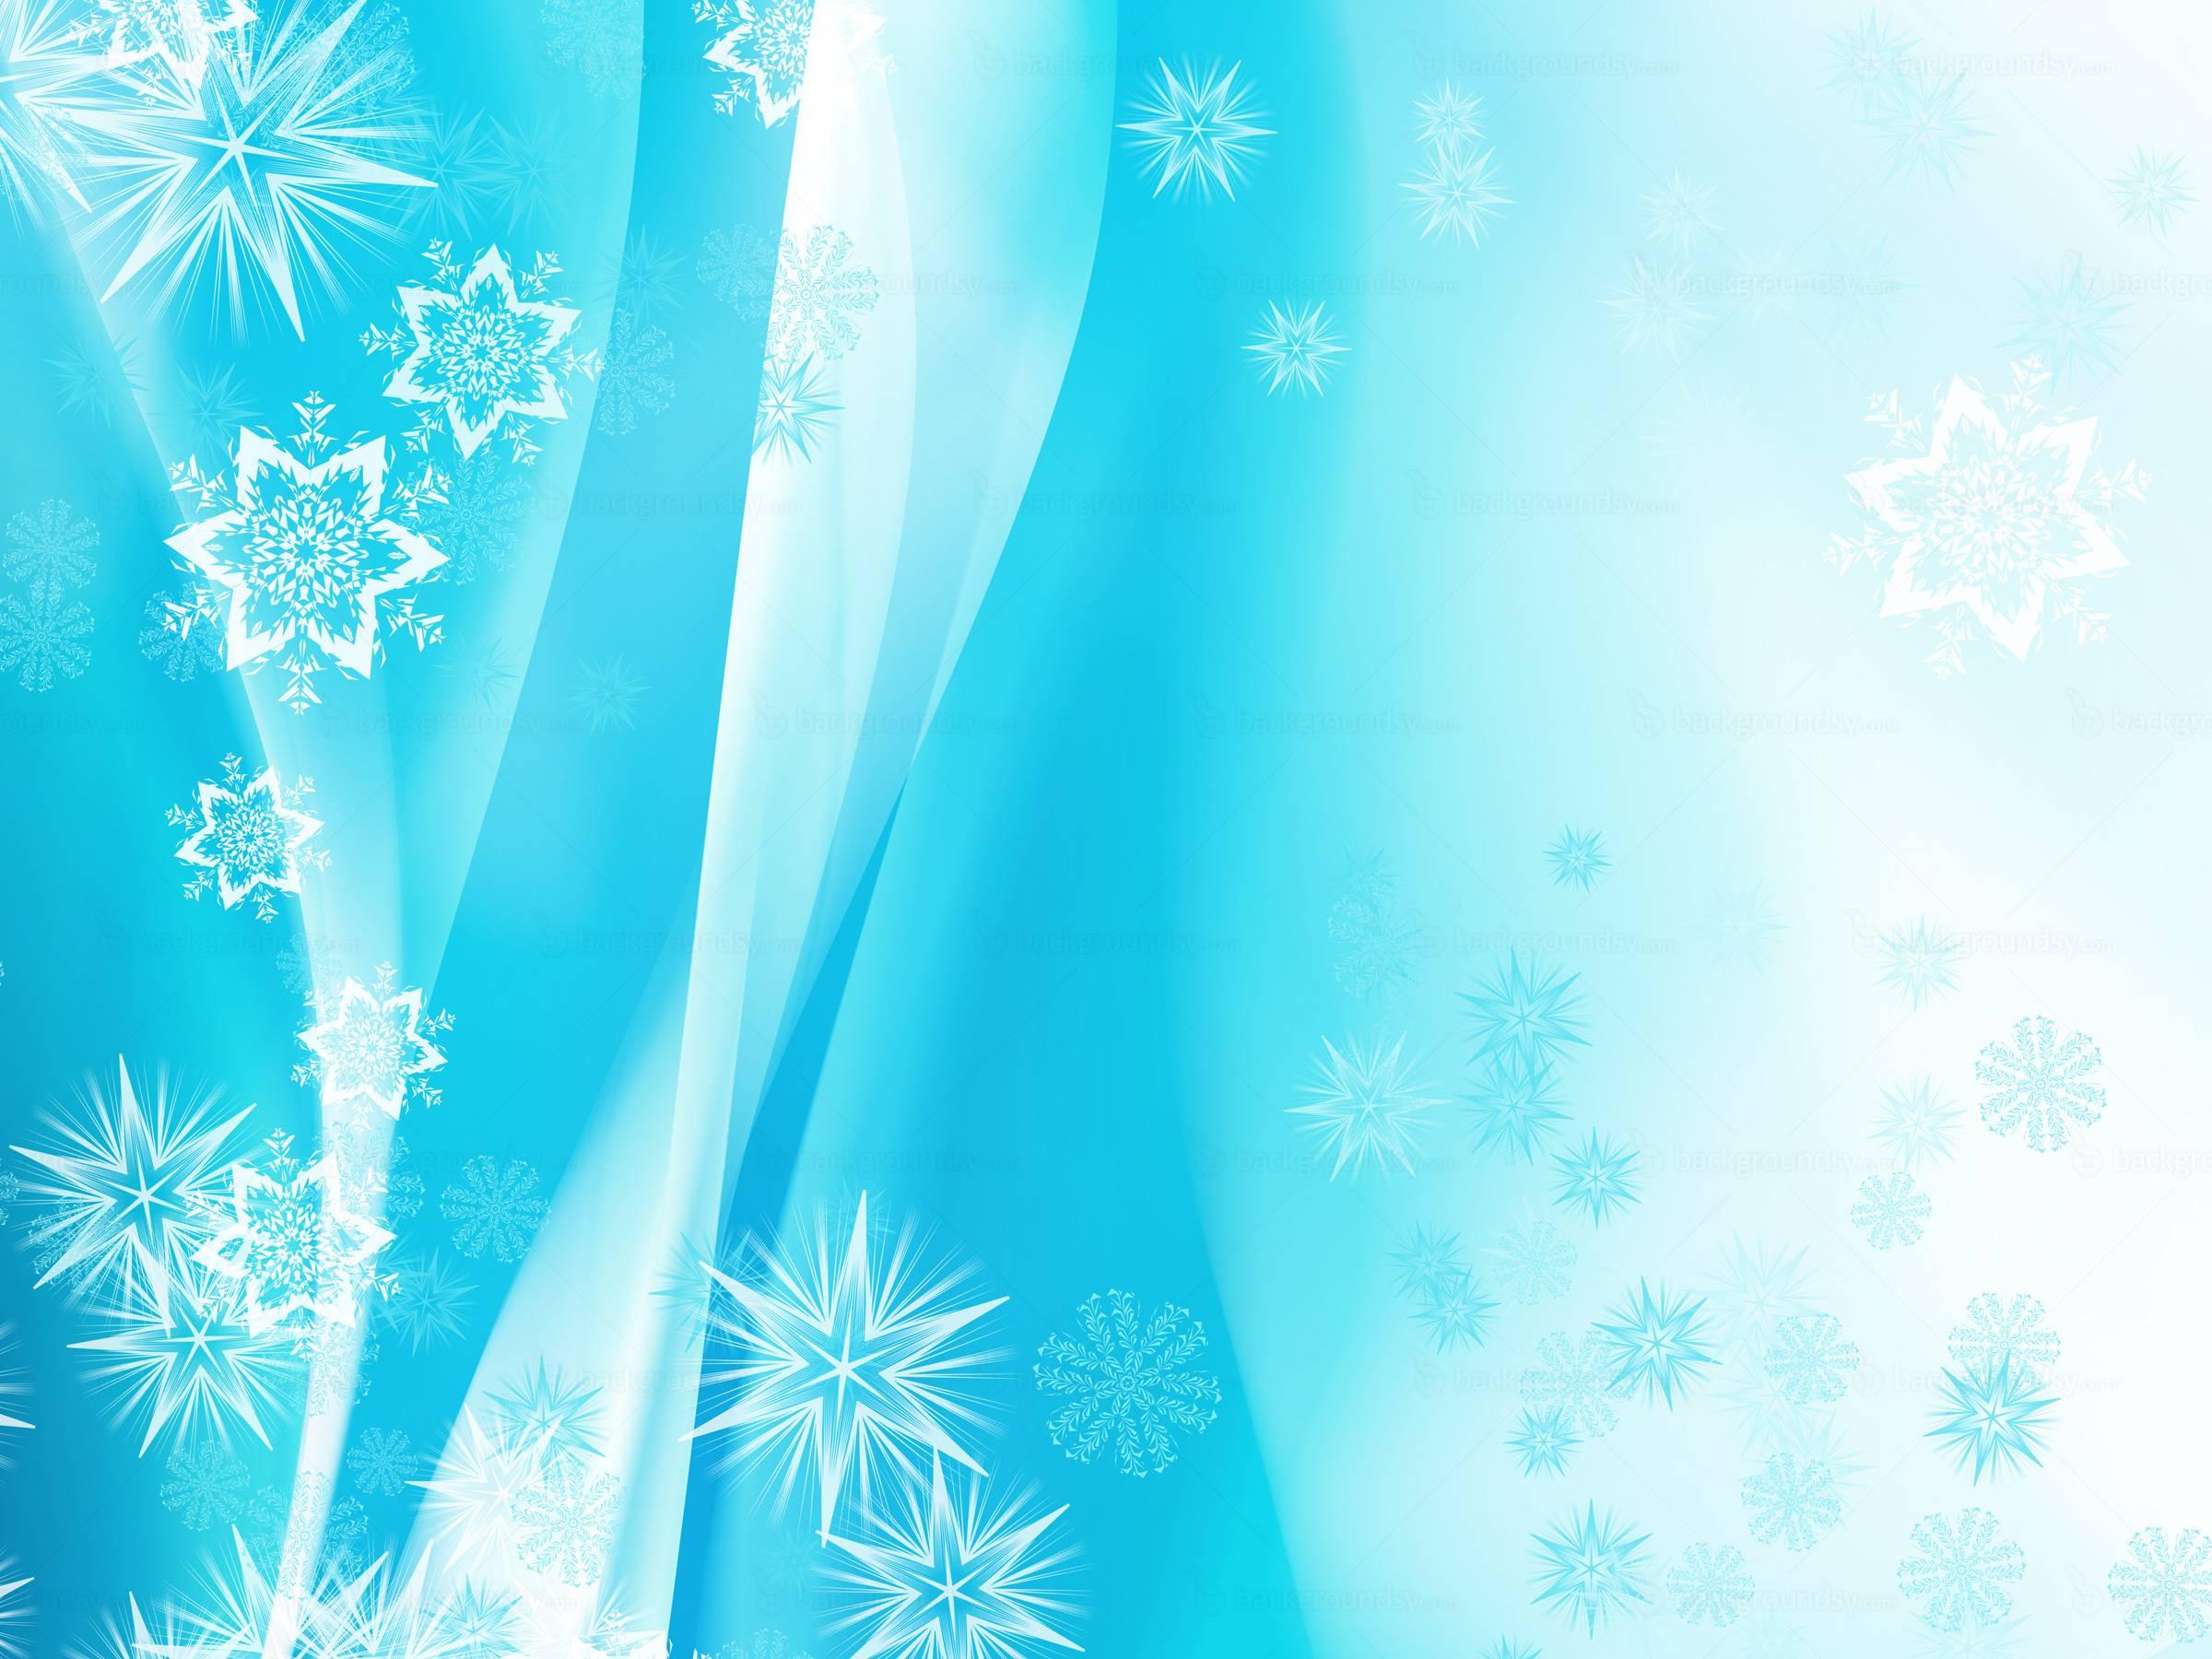 фон для открытки зимний синий курочек